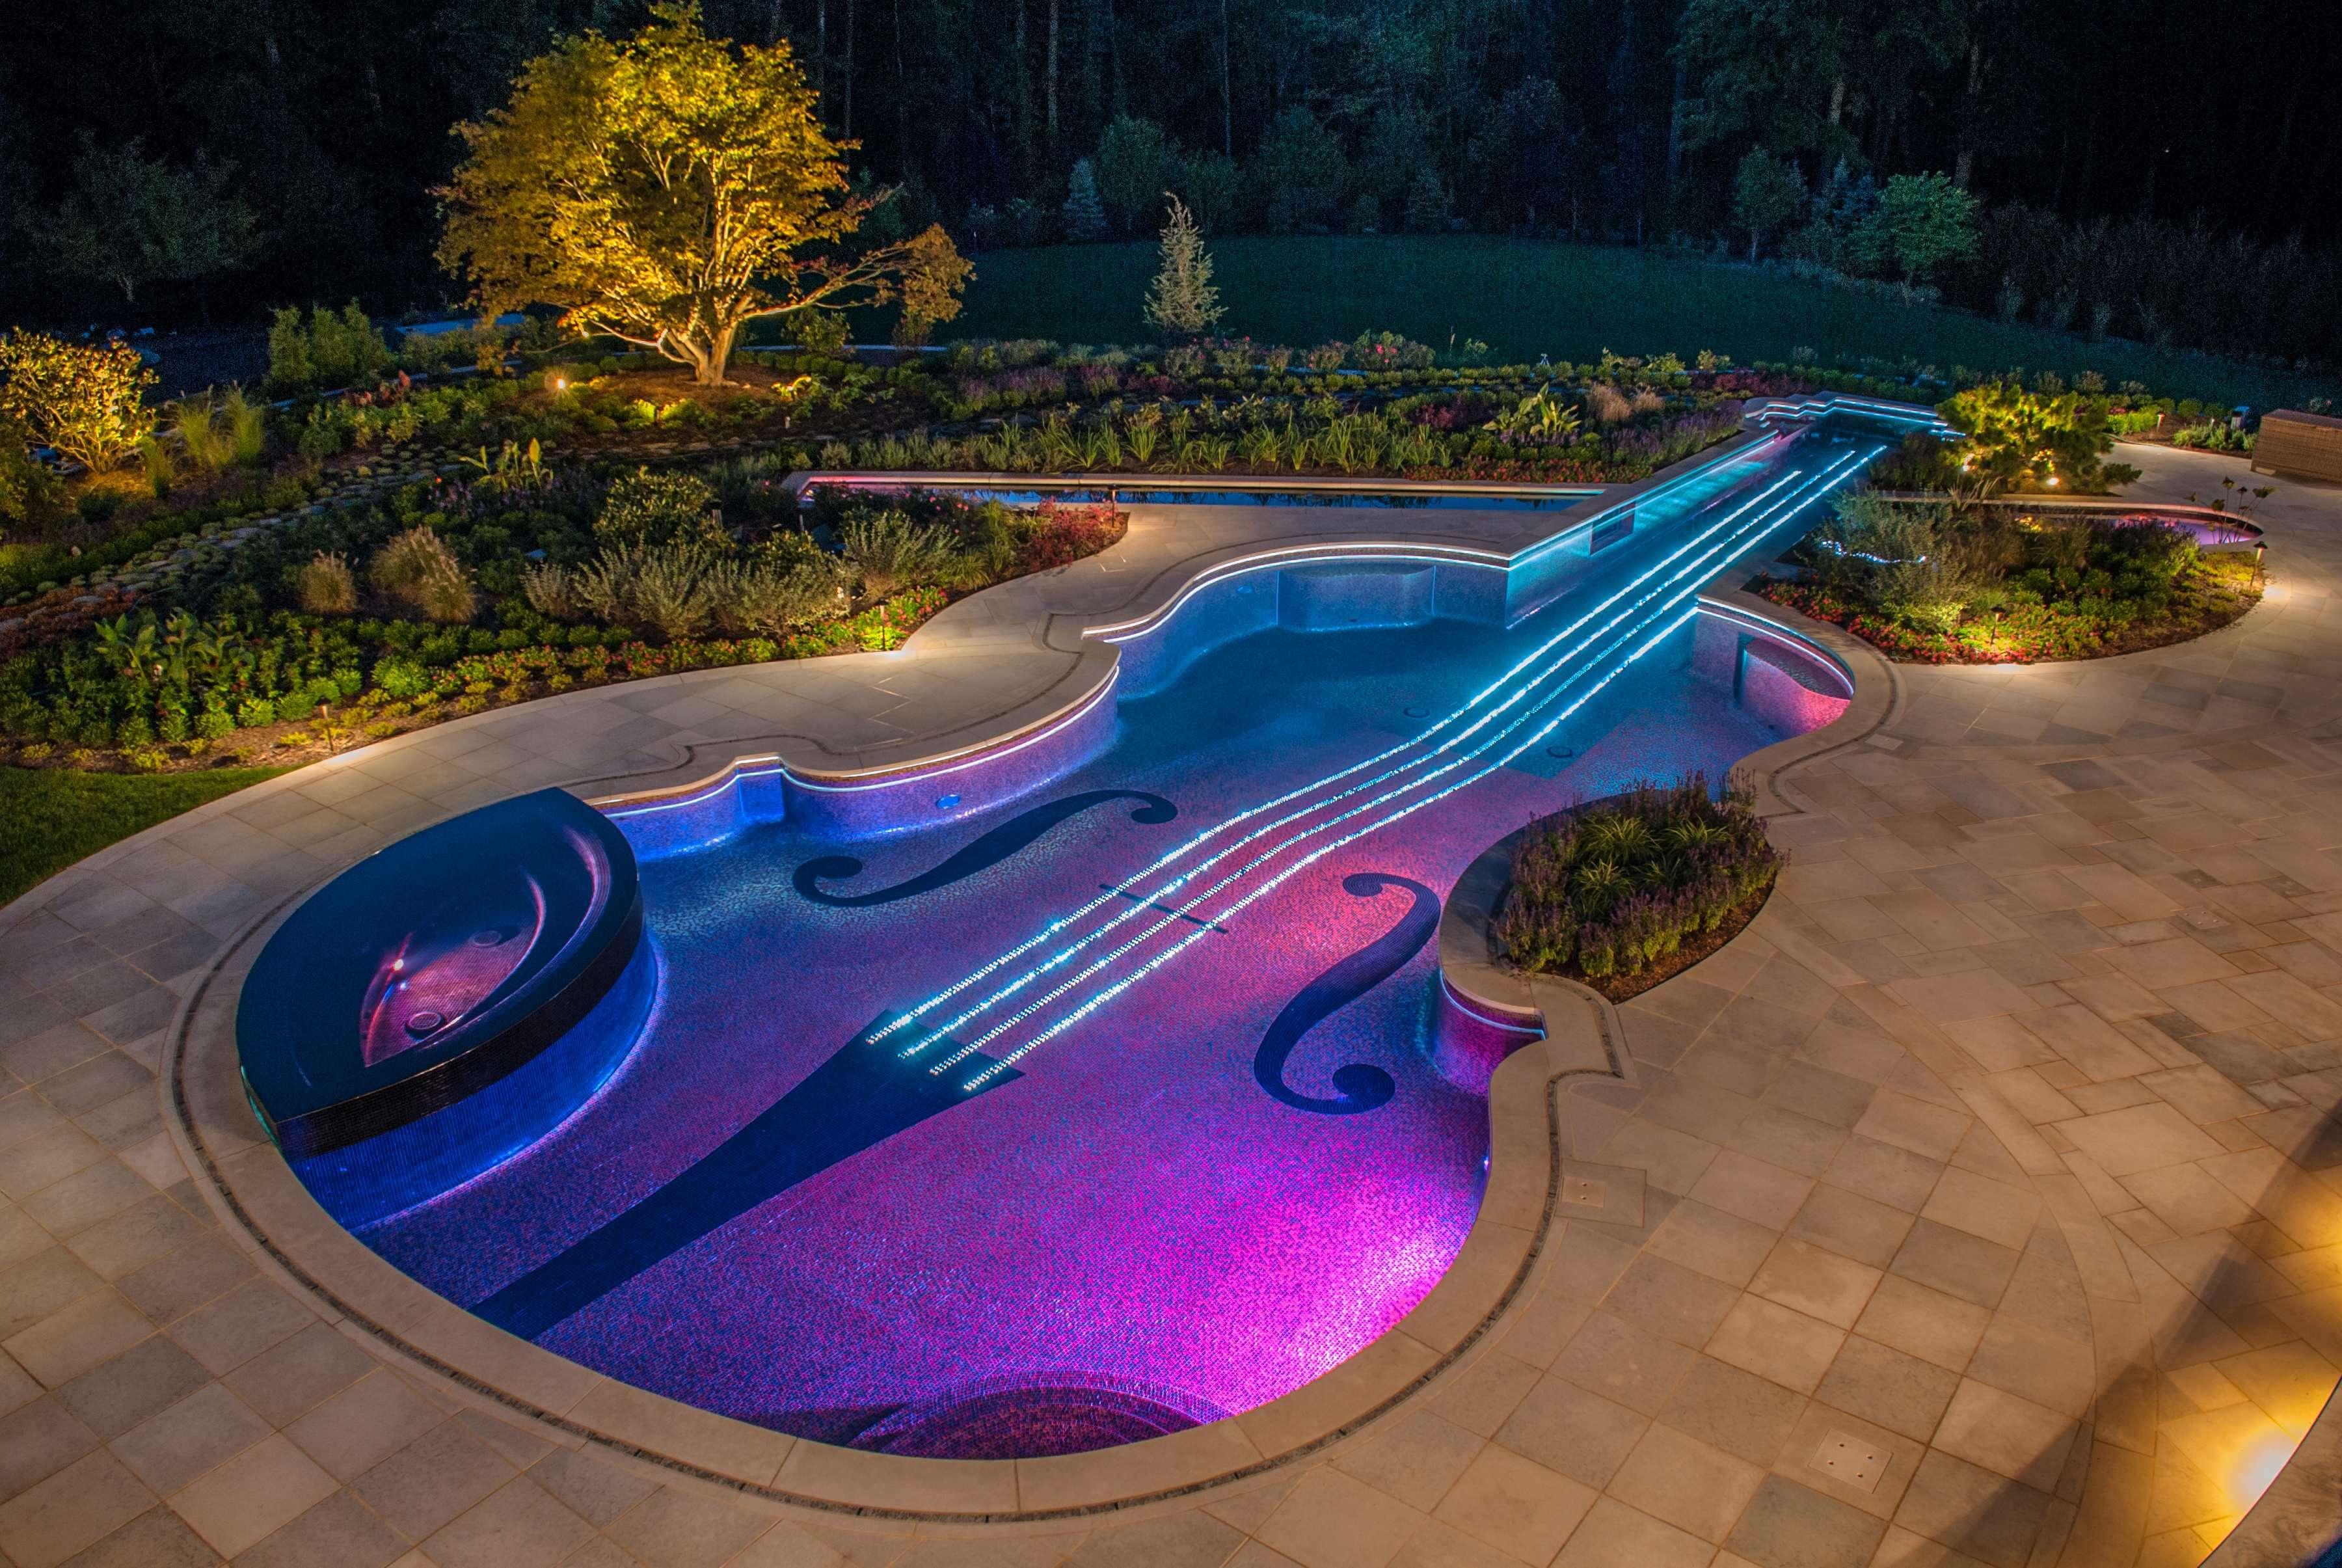 ViolinShaped Swimming Pool 3600 x 2410